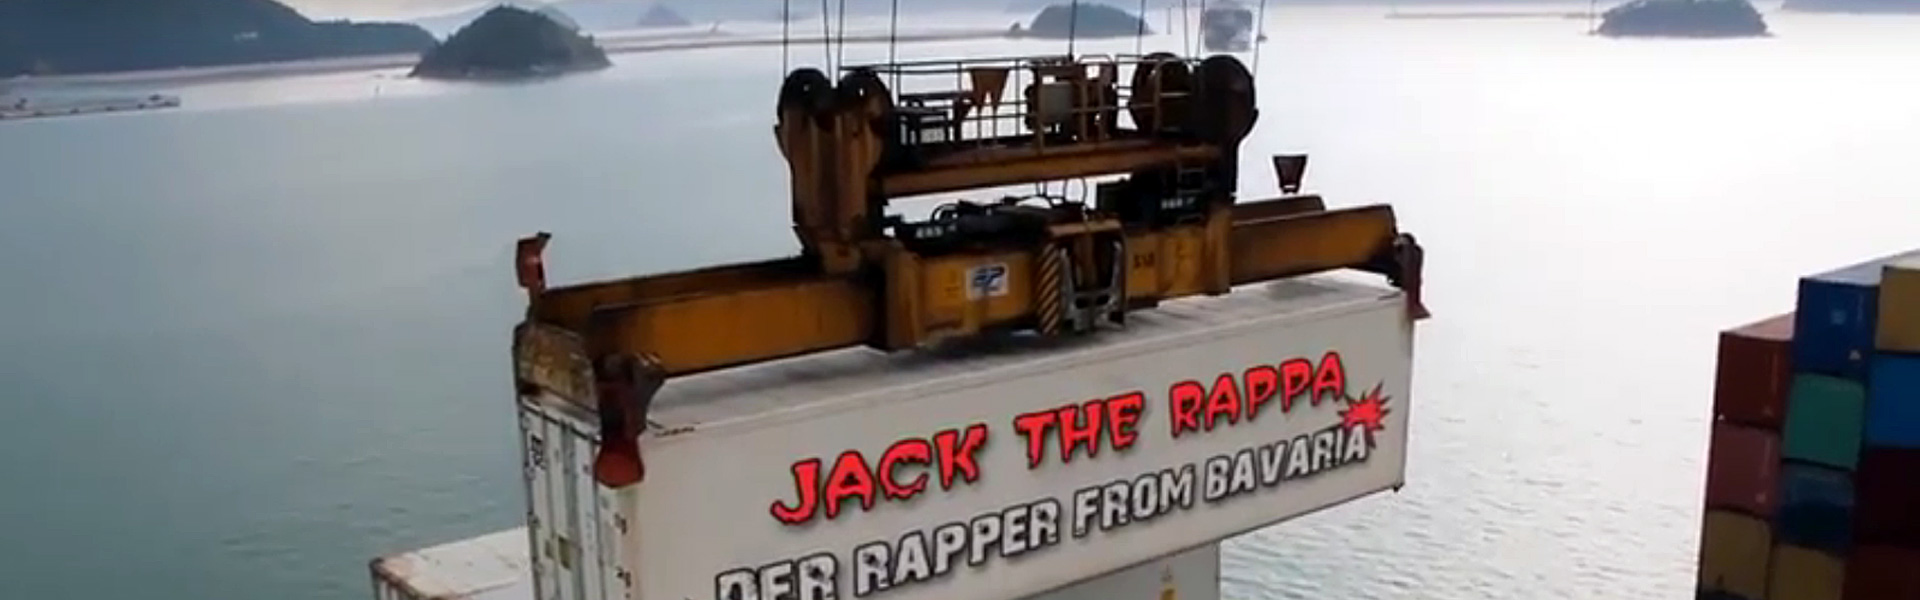 Slider-Container-CD-Album-Der-Rapper-from-Bavaria